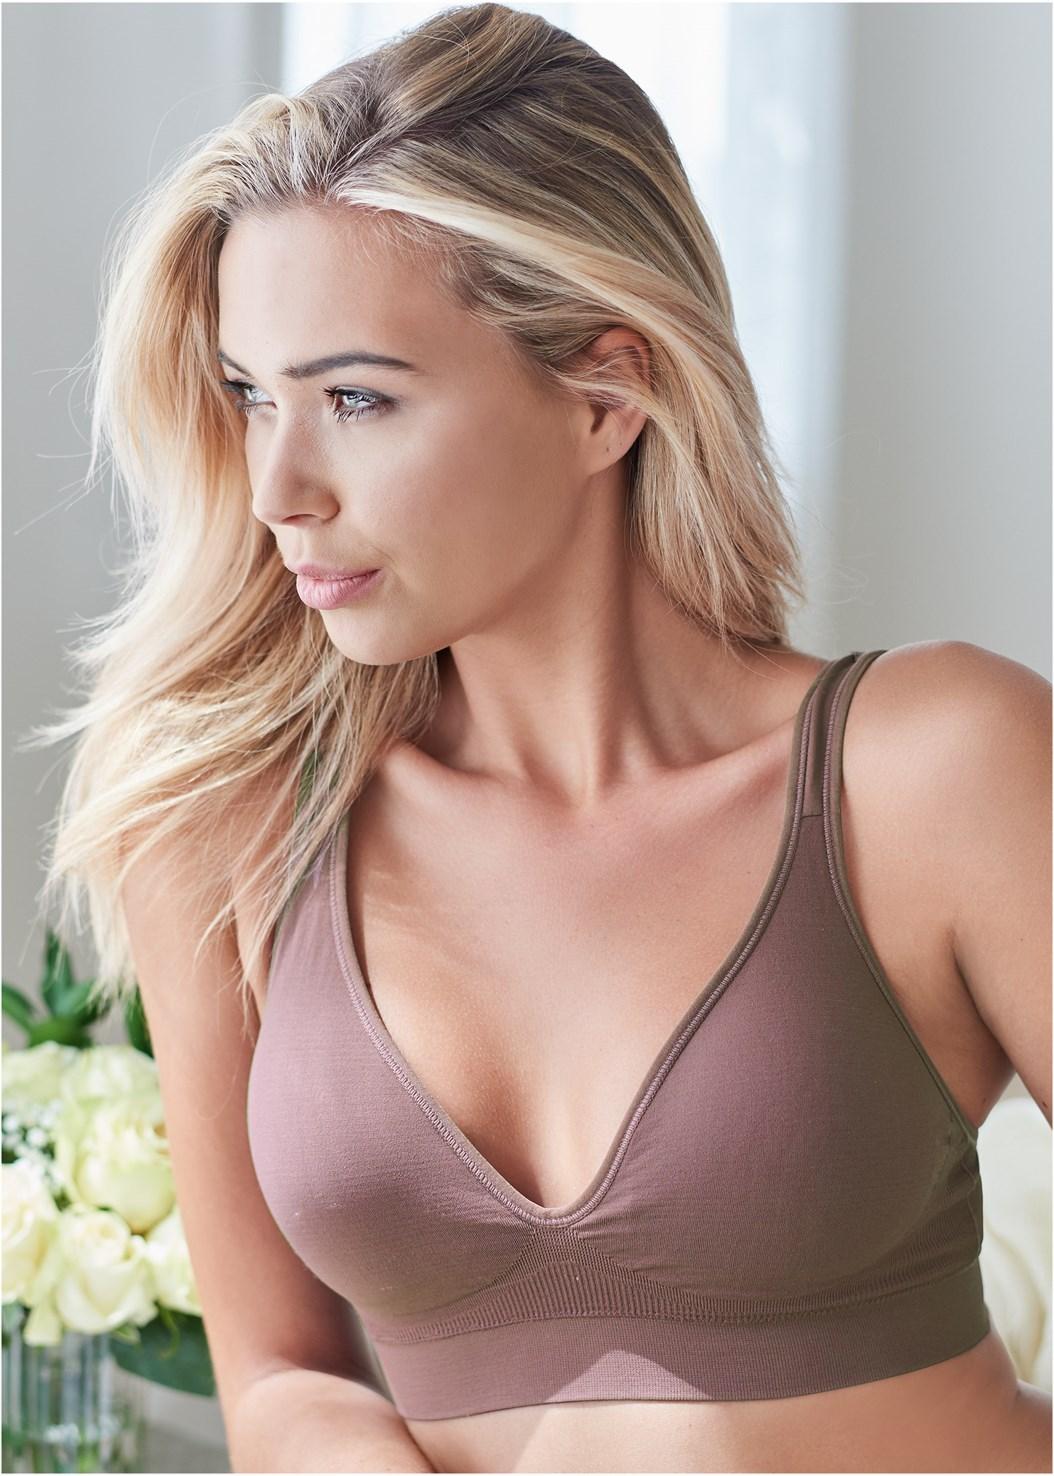 Seamless Lace Comfort Bra,Stretch Hipster 5Pk